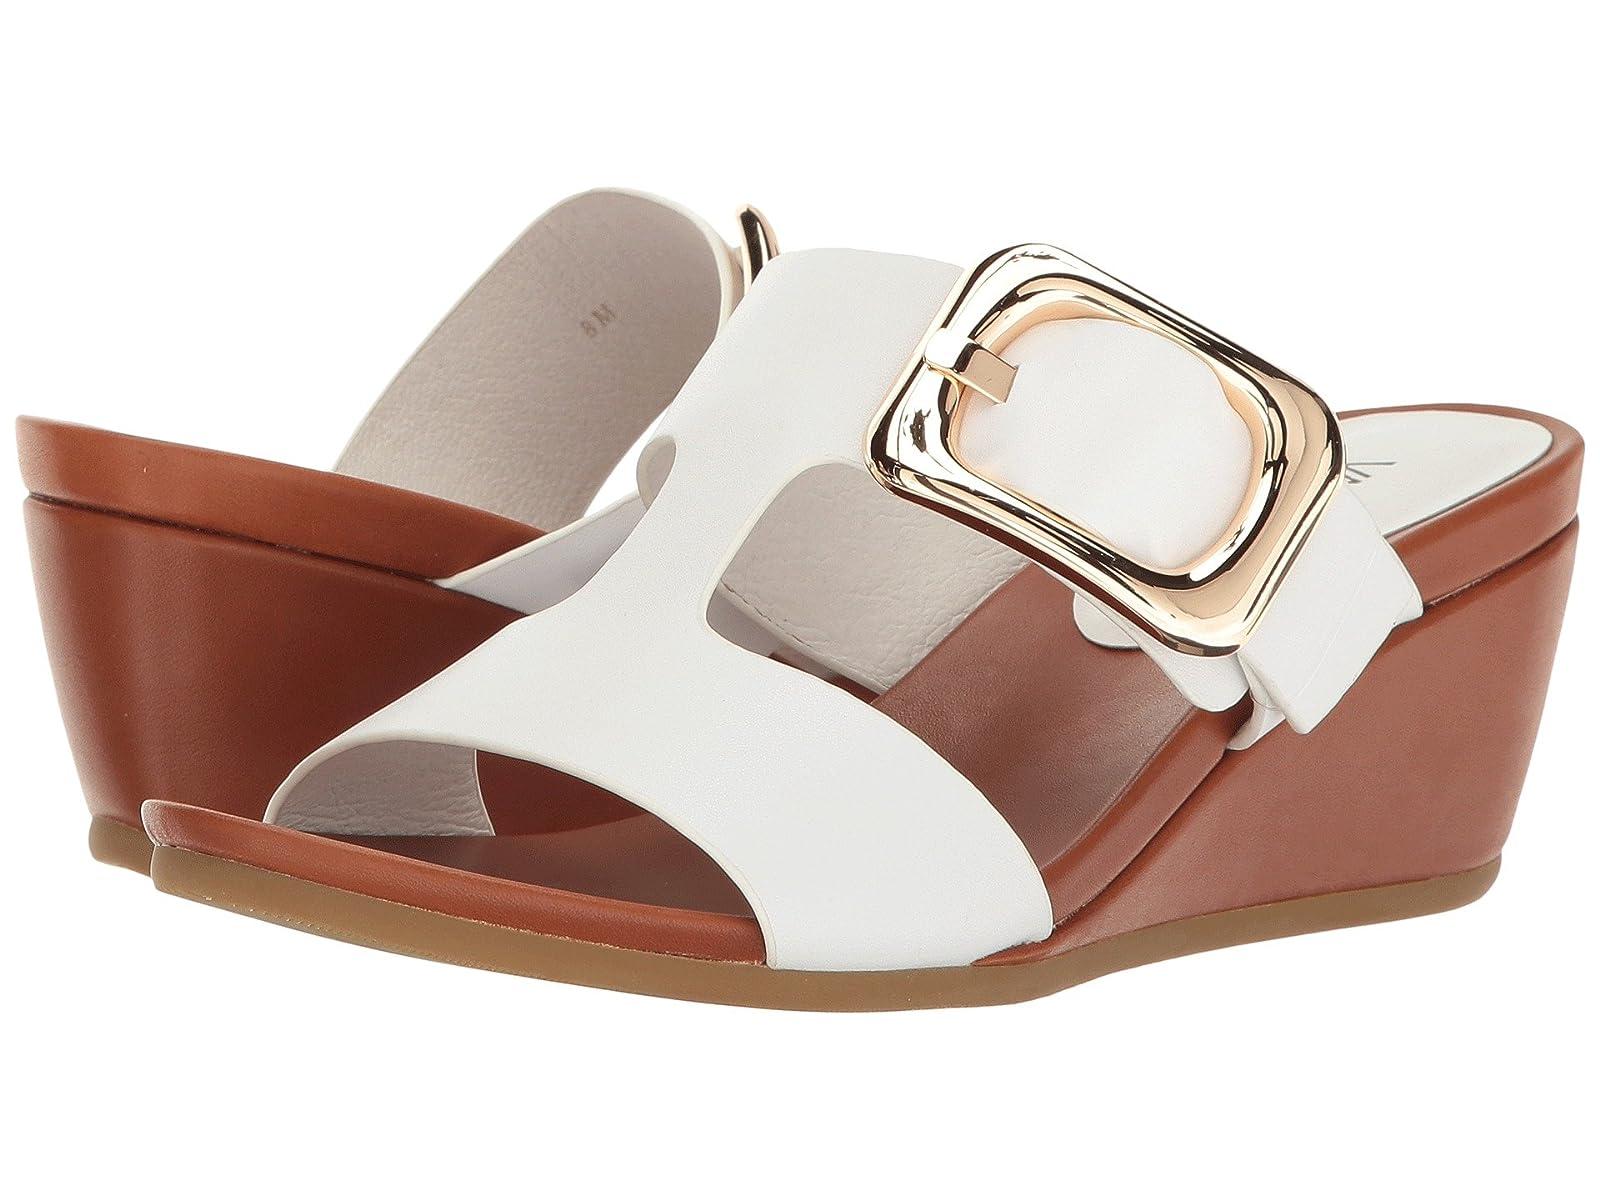 Vaneli DanelCheap and distinctive eye-catching shoes